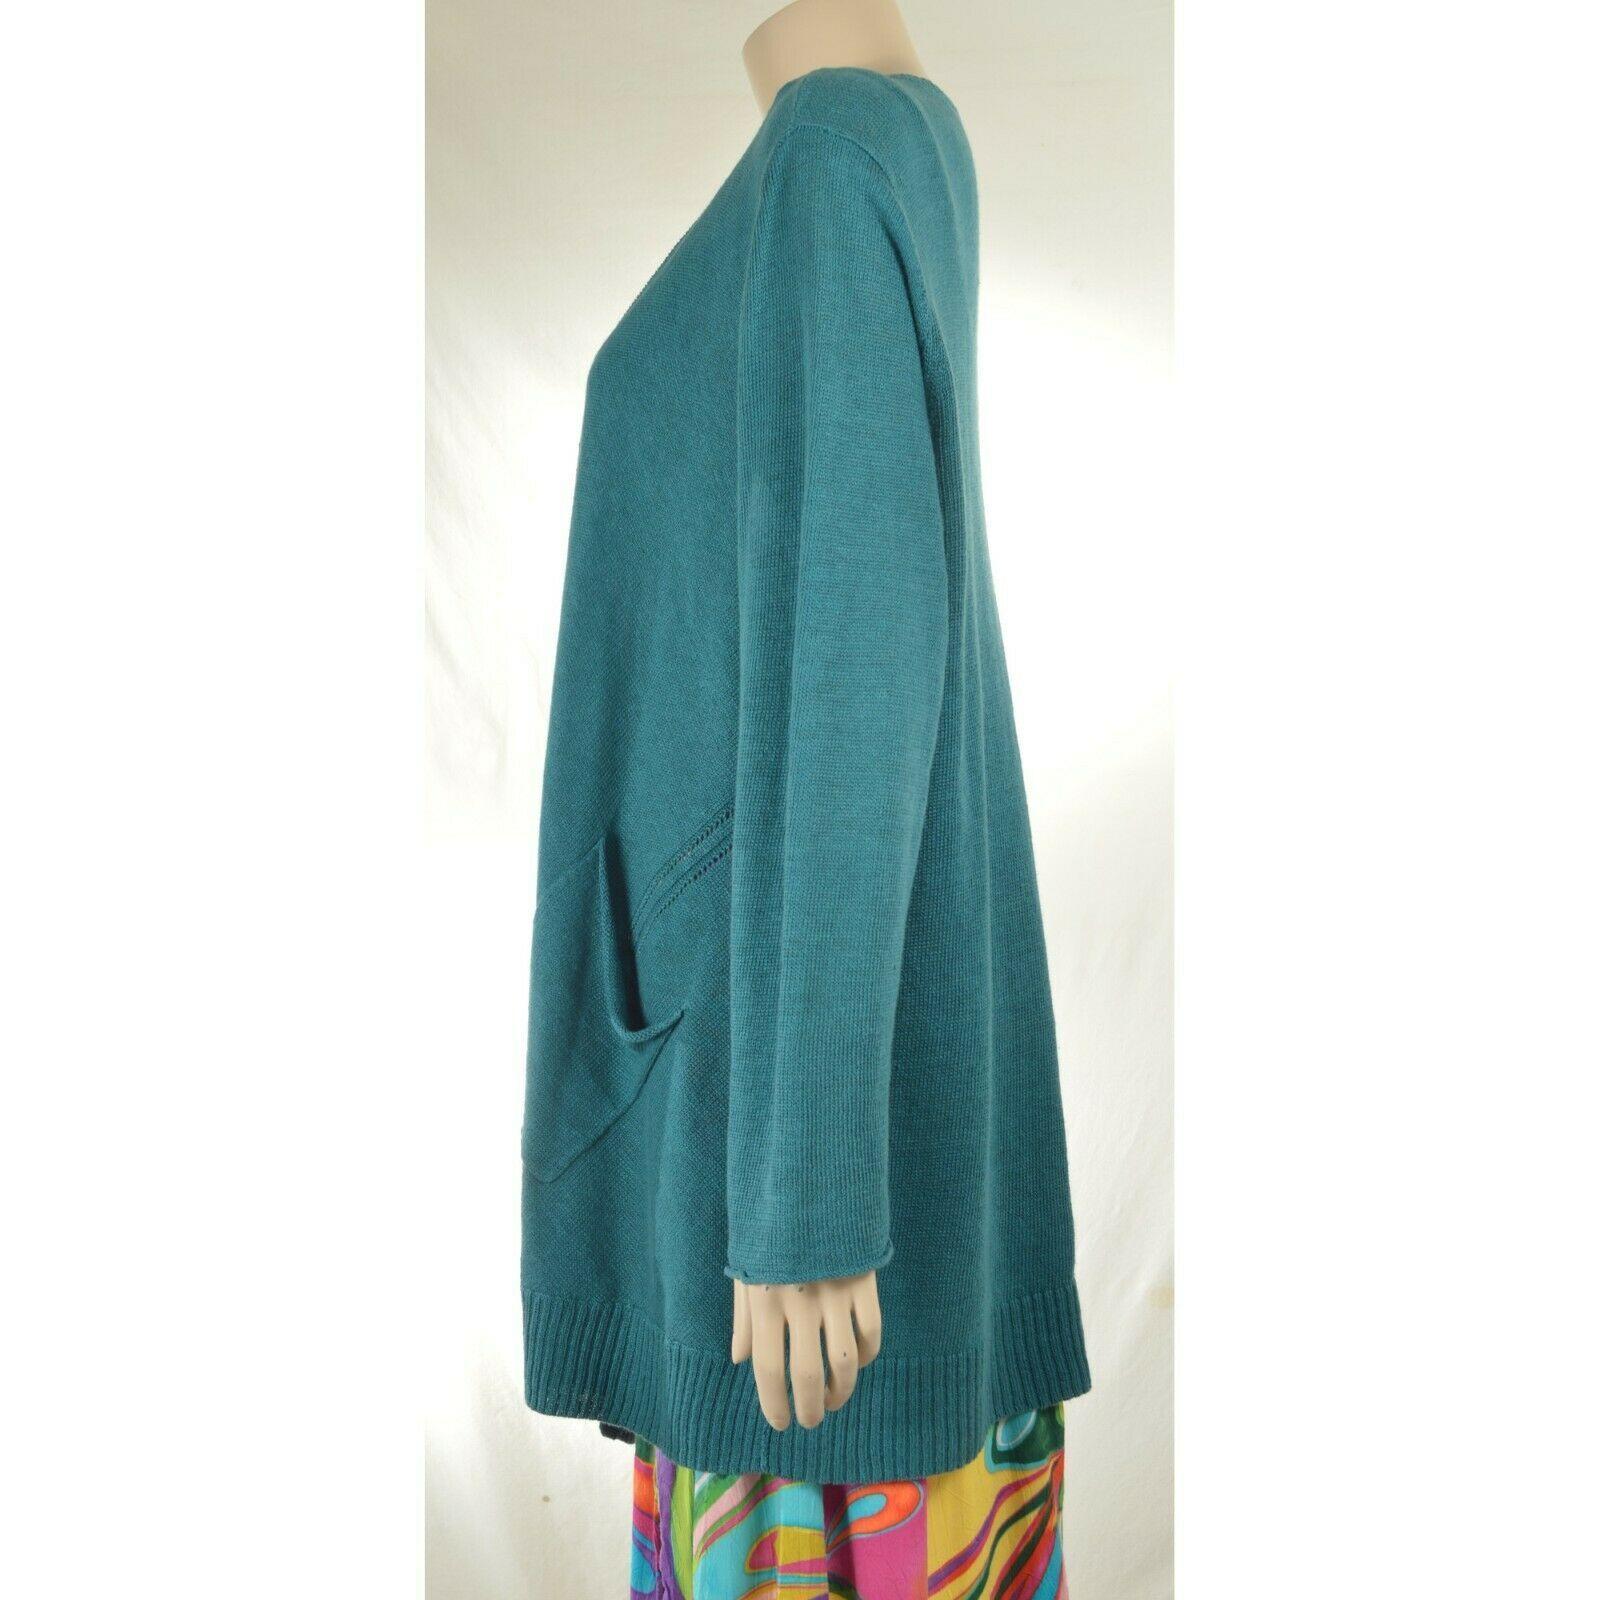 Eileen Fisher sweater cardigan SZ L teal 100% linen knit pockets soft long s image 11